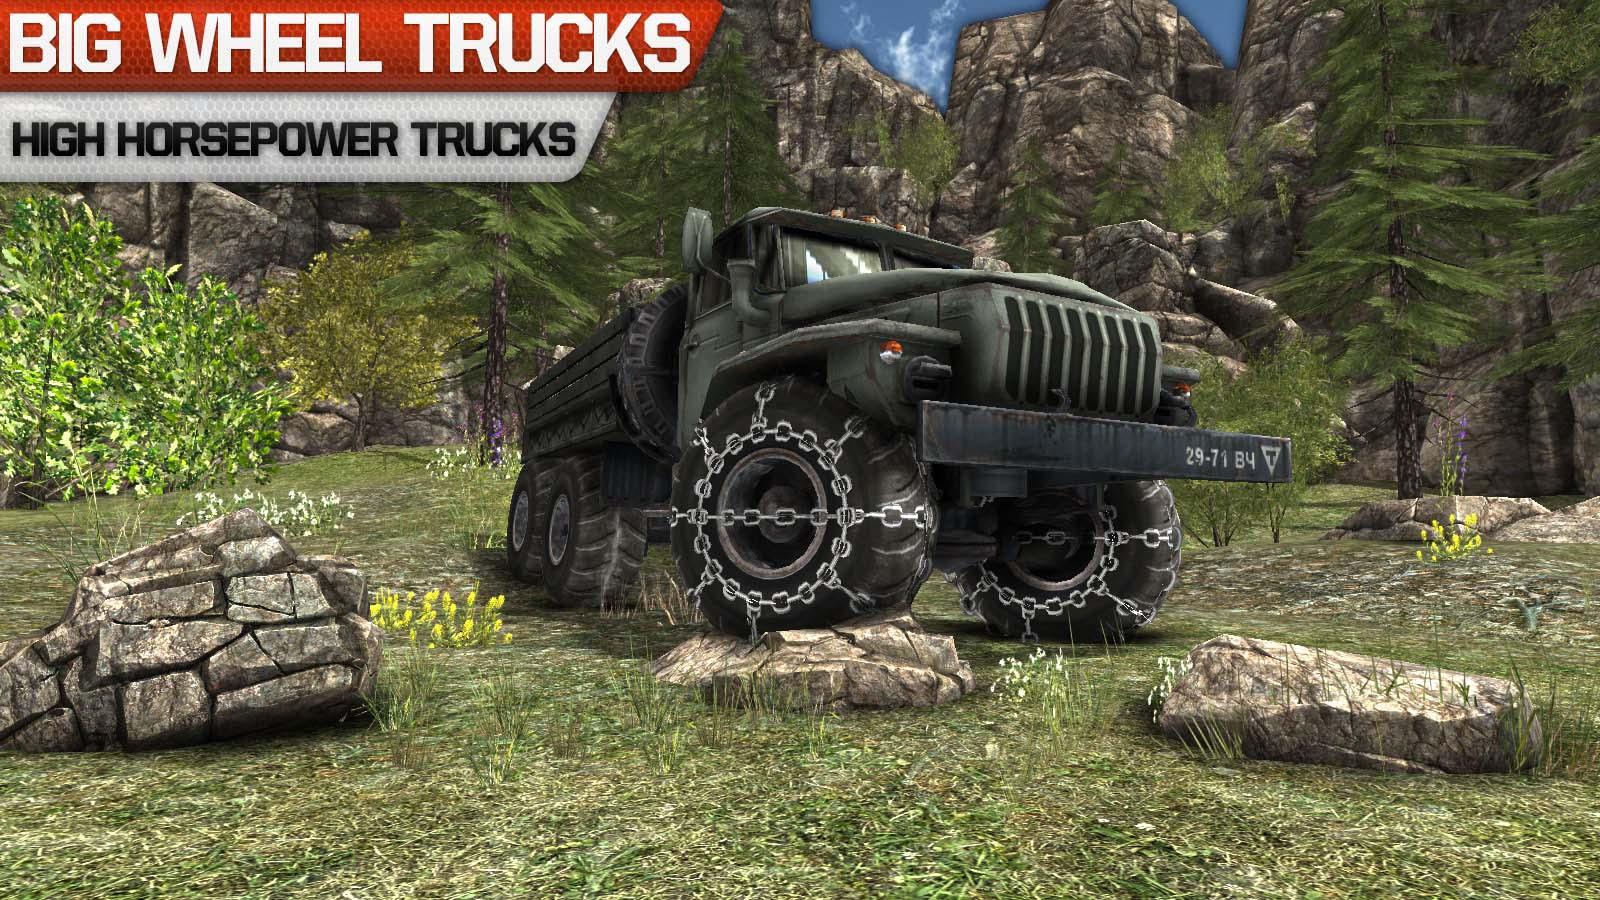 Truck driver 3D: Offroad v1.11 .apk File